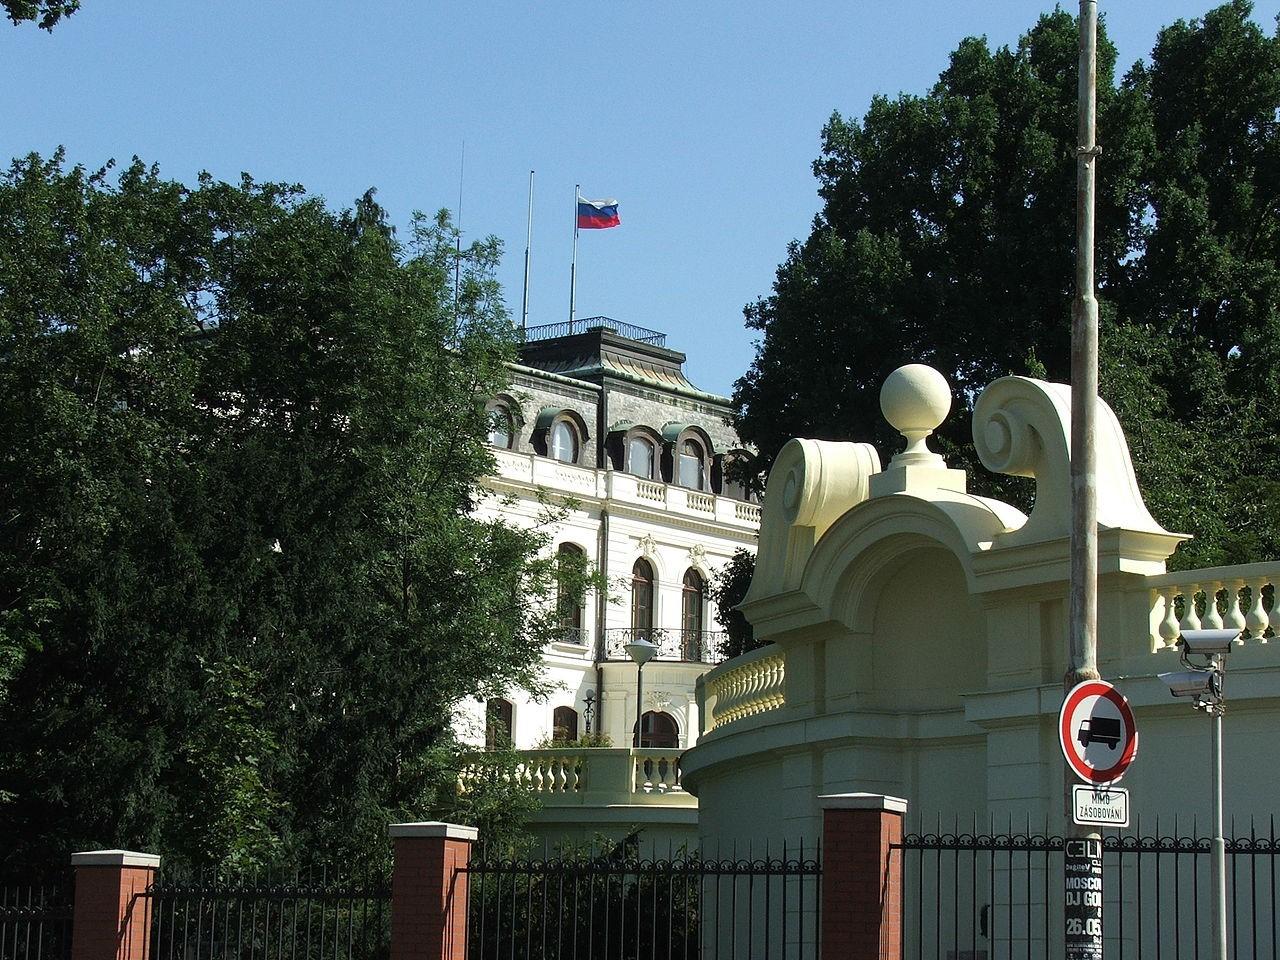 Czech Republic, Bulgaria, Ukraine: Russia's GRU Had a Special Mission